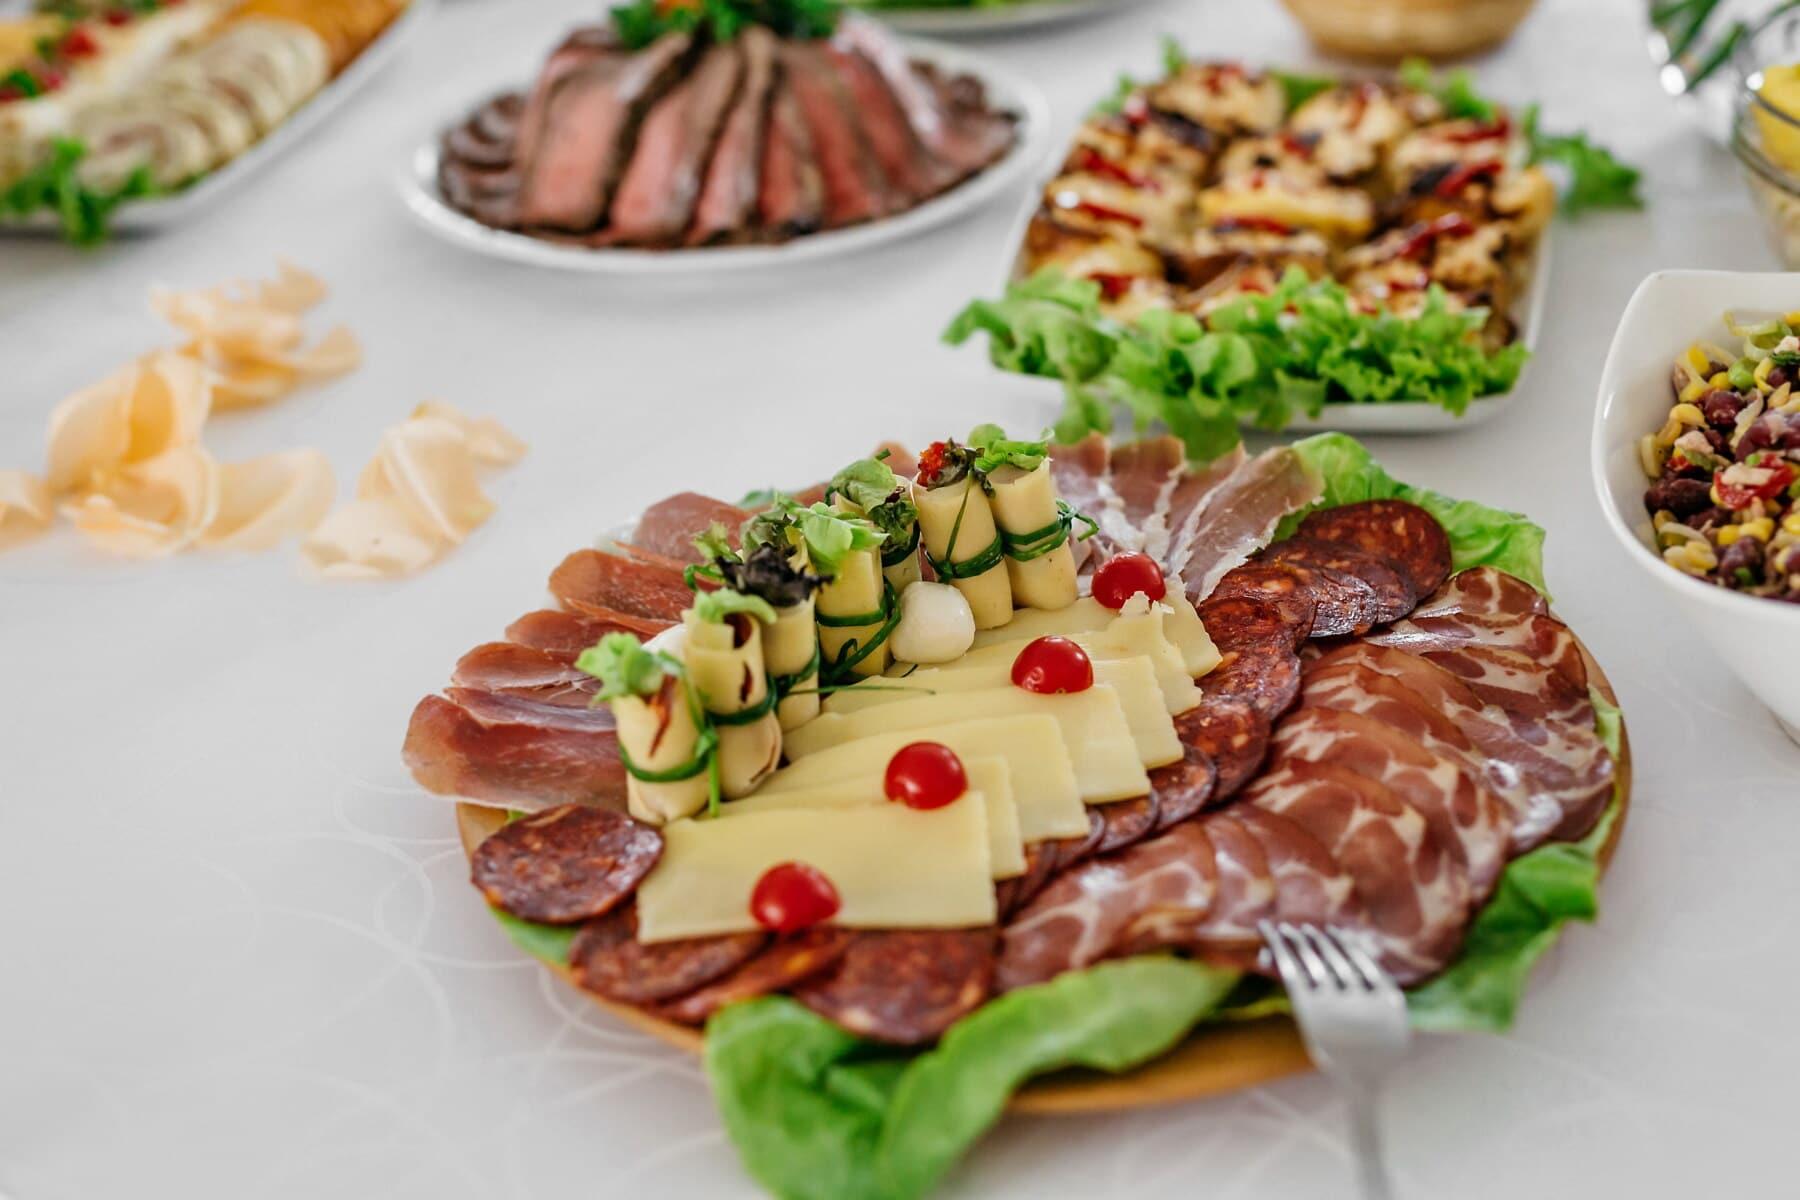 sushi, ham, cheese, sausage, pork loin, pork, appetizer, plate, dinner, lunch